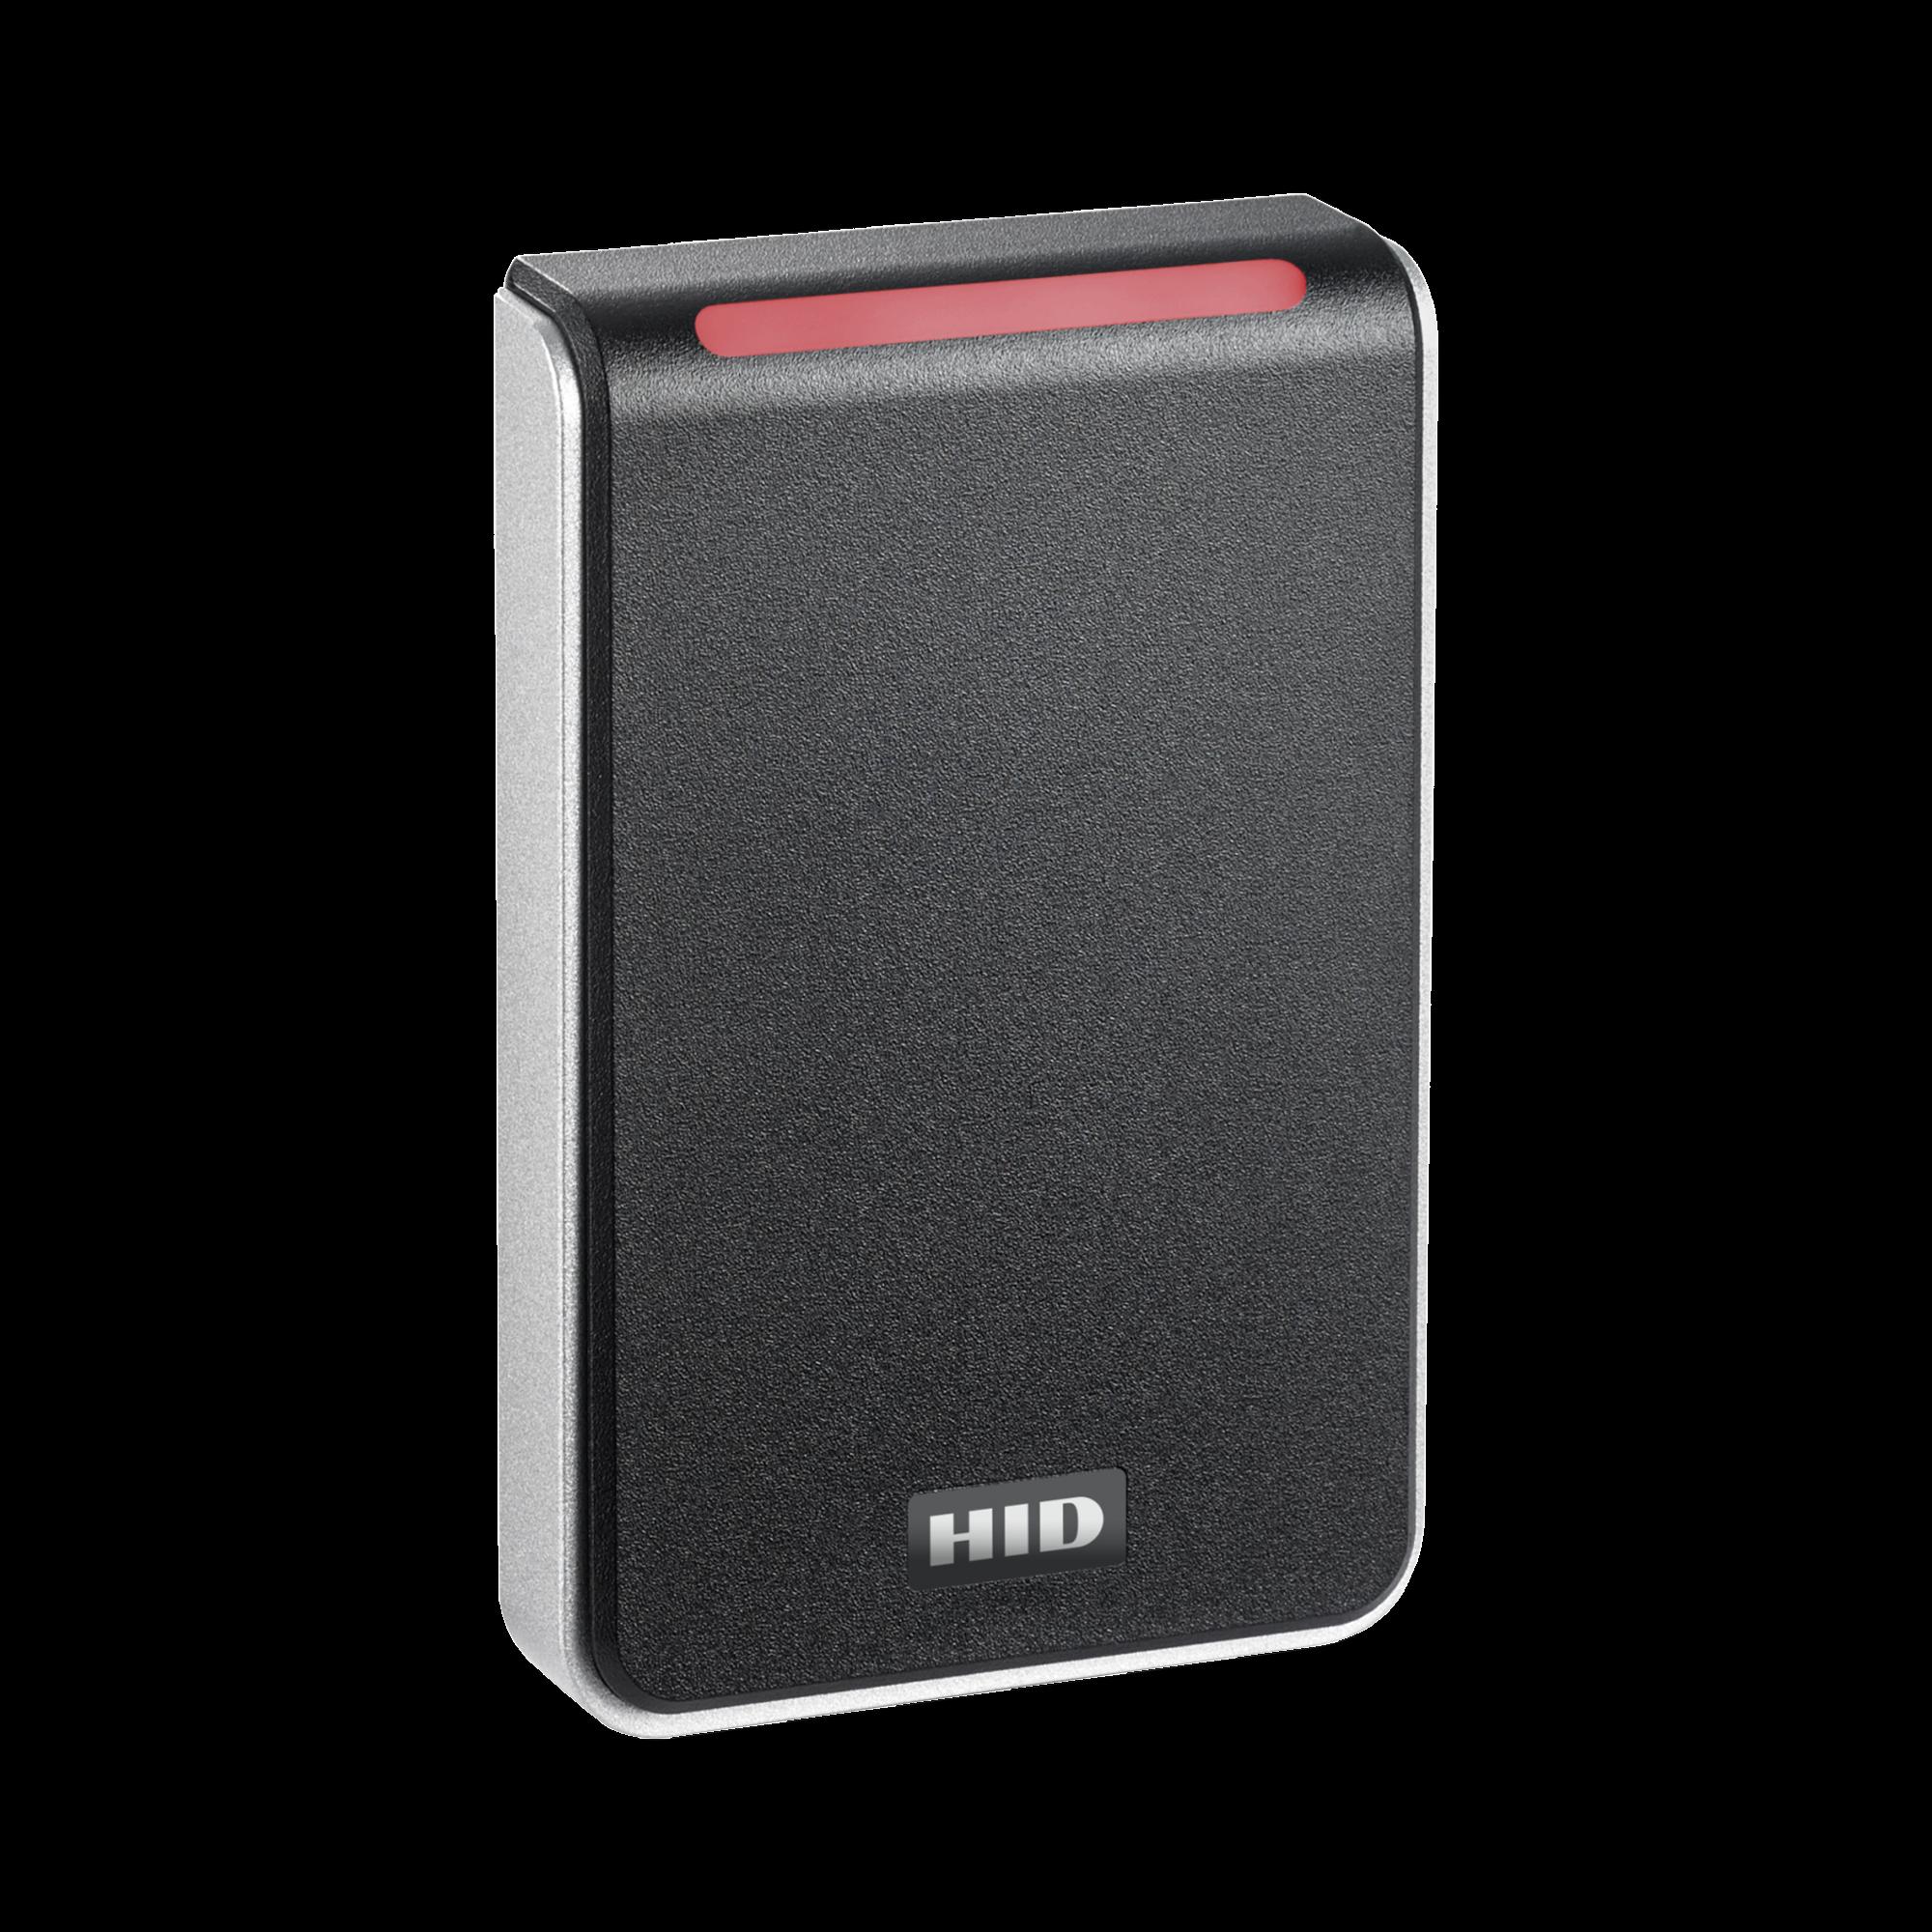 Lector R40 SIGNO Estandar  Multitecnologia/ 40NKS-00-000000/ Garantia de Por Vida/ Pigtail/Wiegand & OSDP